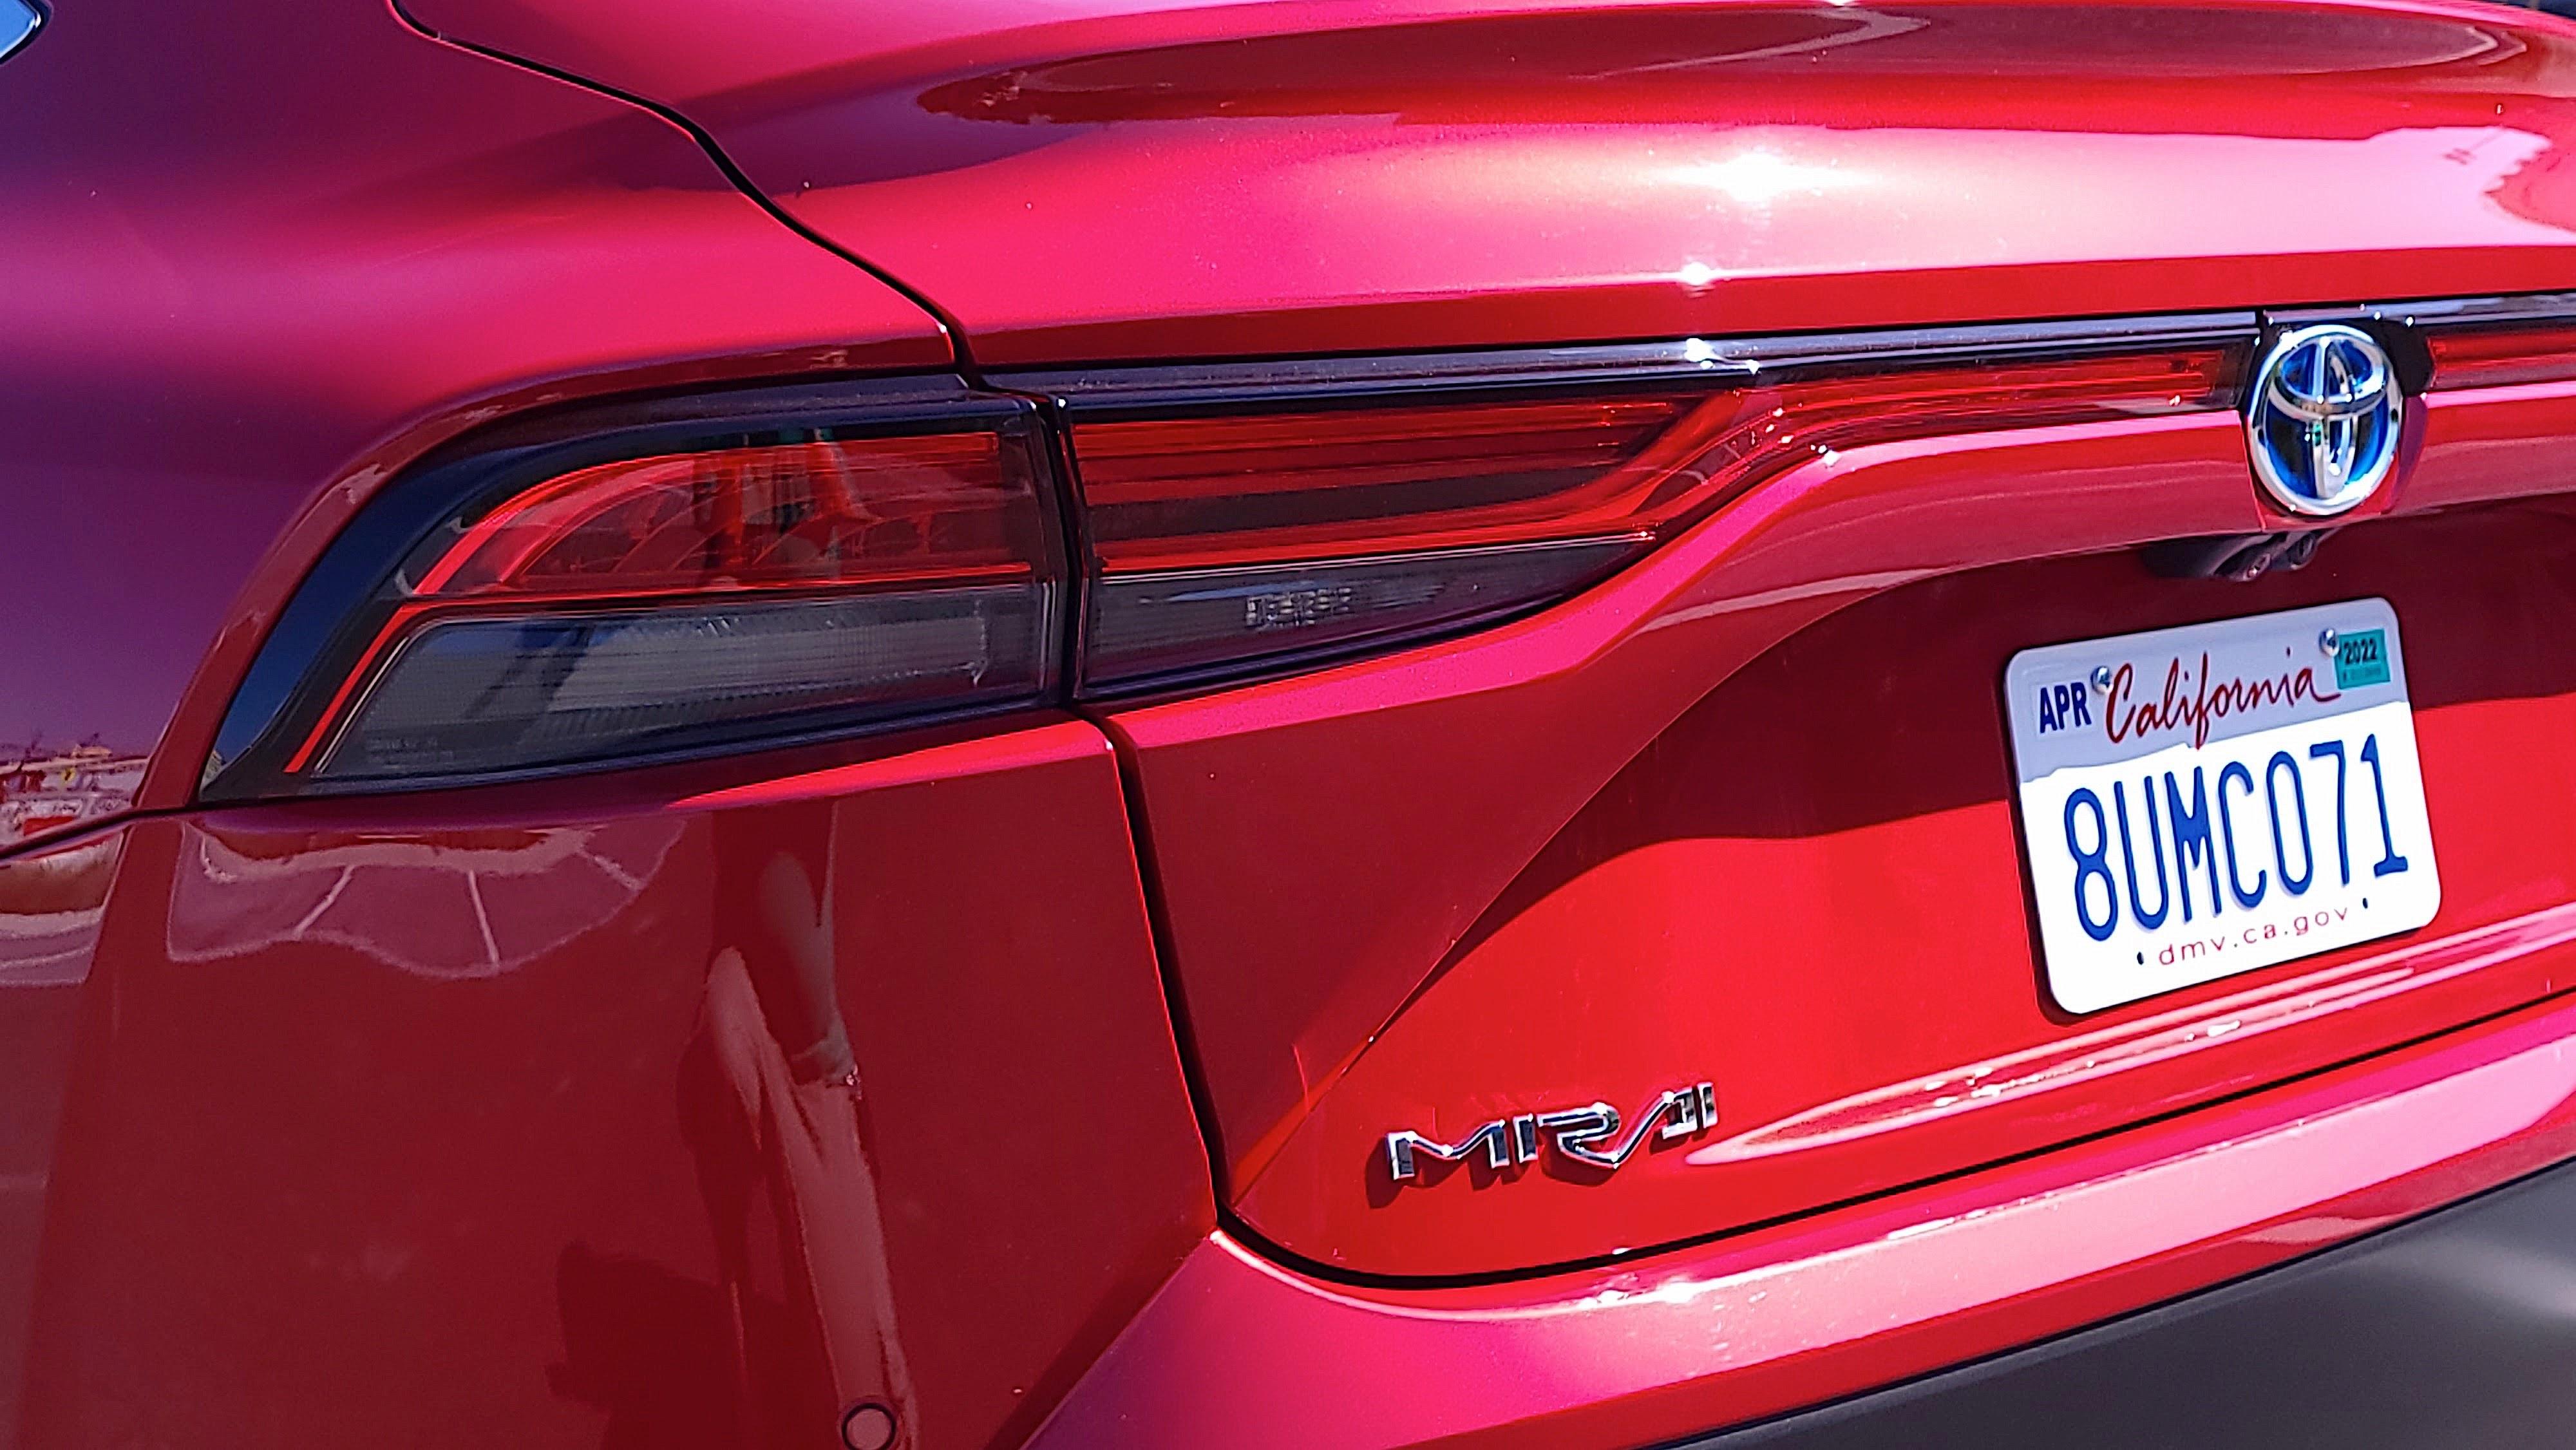 Close-up of Mirai badge on rear of car